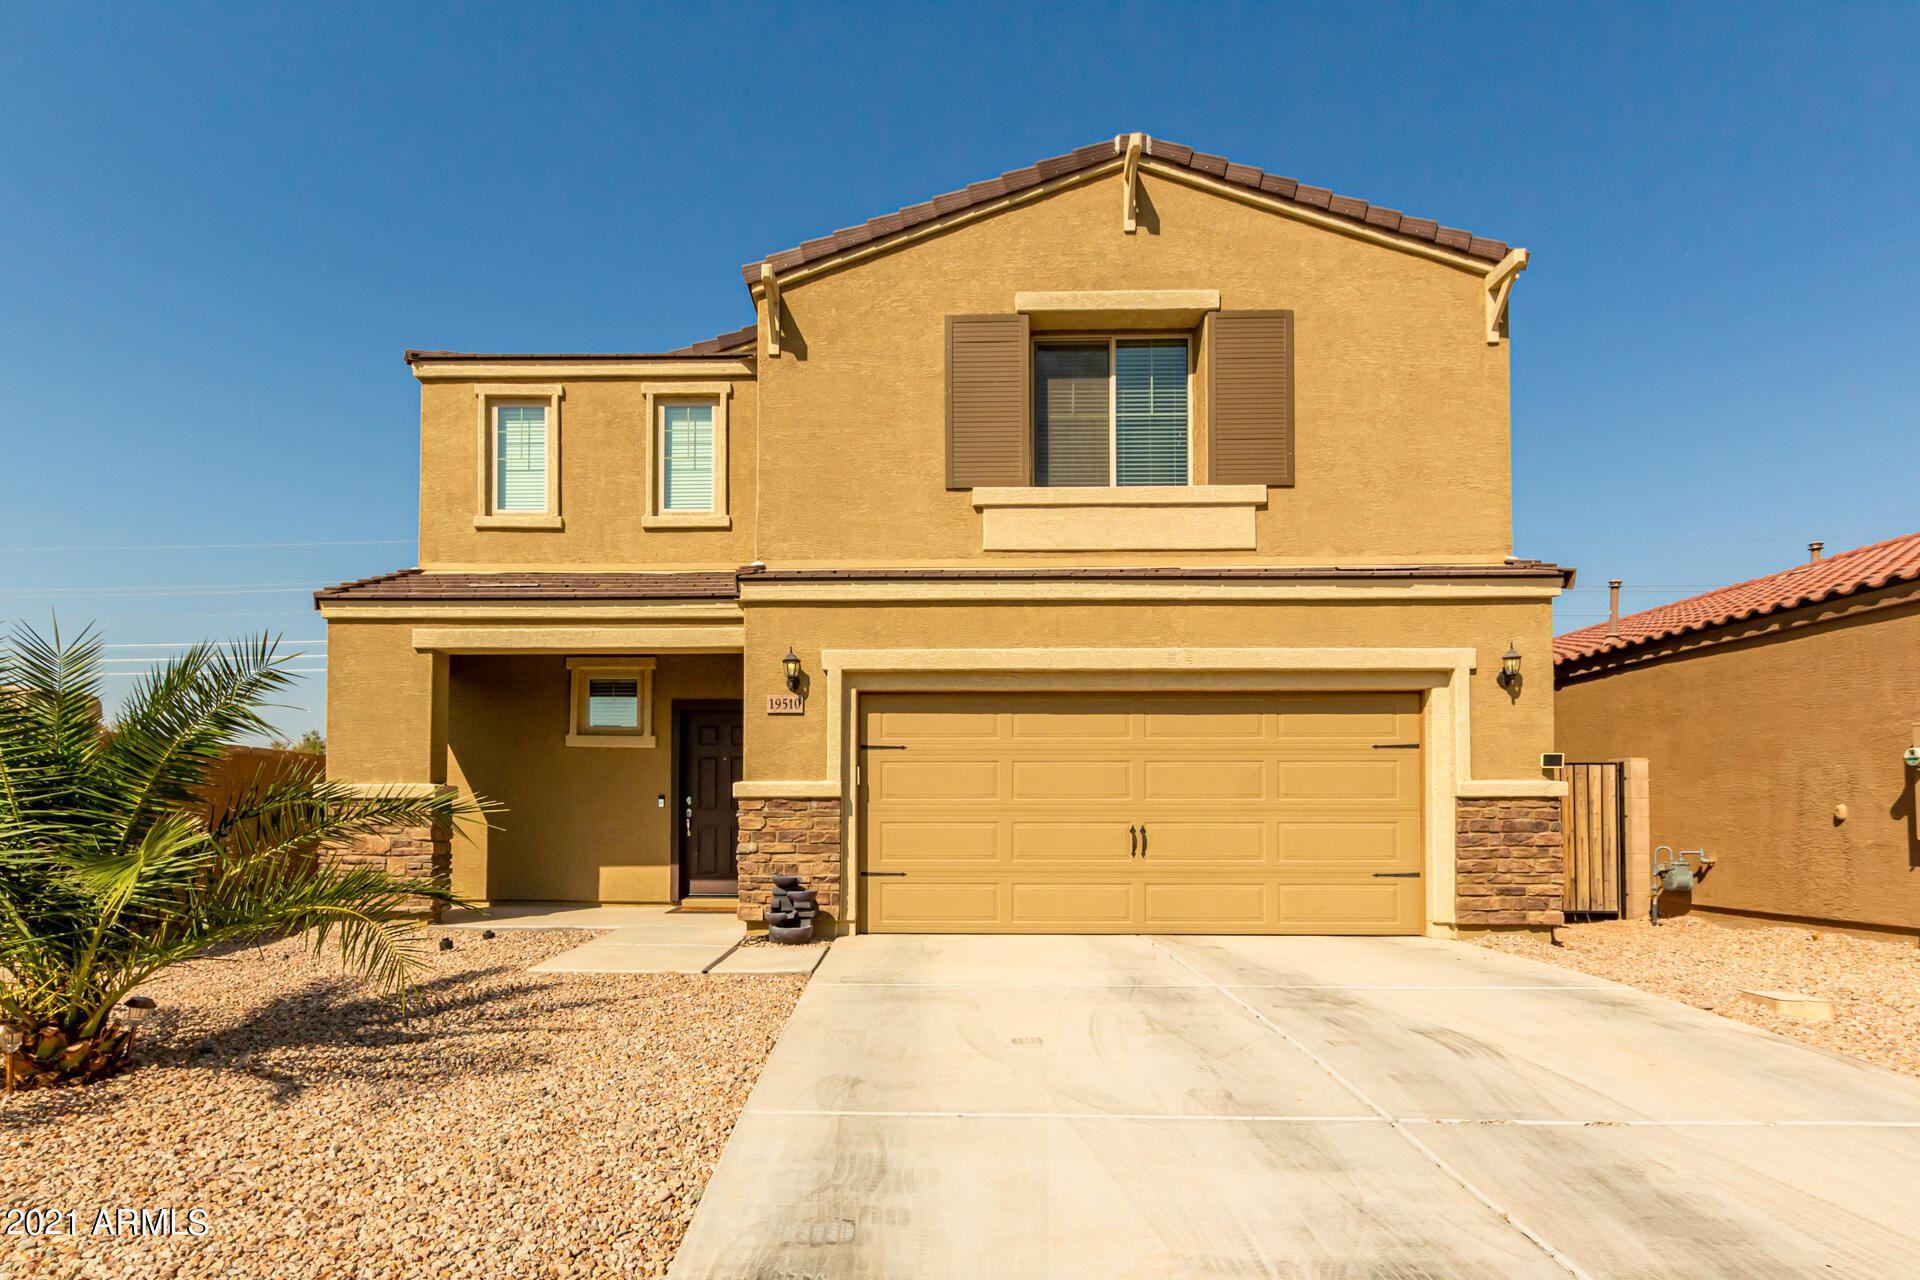 Photo for 19510 N SALERNO Circle, Maricopa, AZ 85138 (MLS # 6297471)